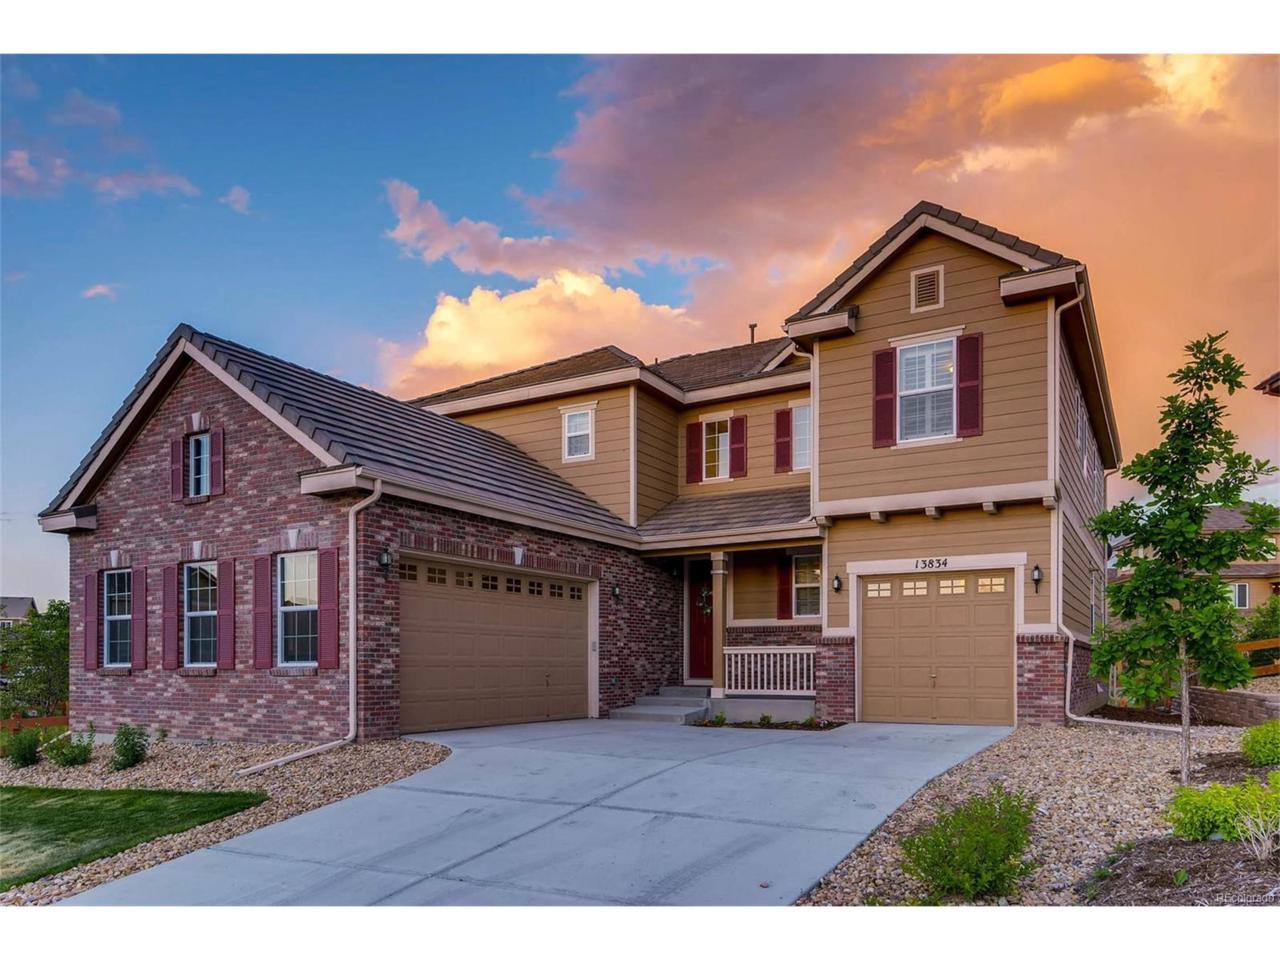 13834 Ashgrove Circle, Parker, CO 80134 (MLS #5752595) :: 8z Real Estate